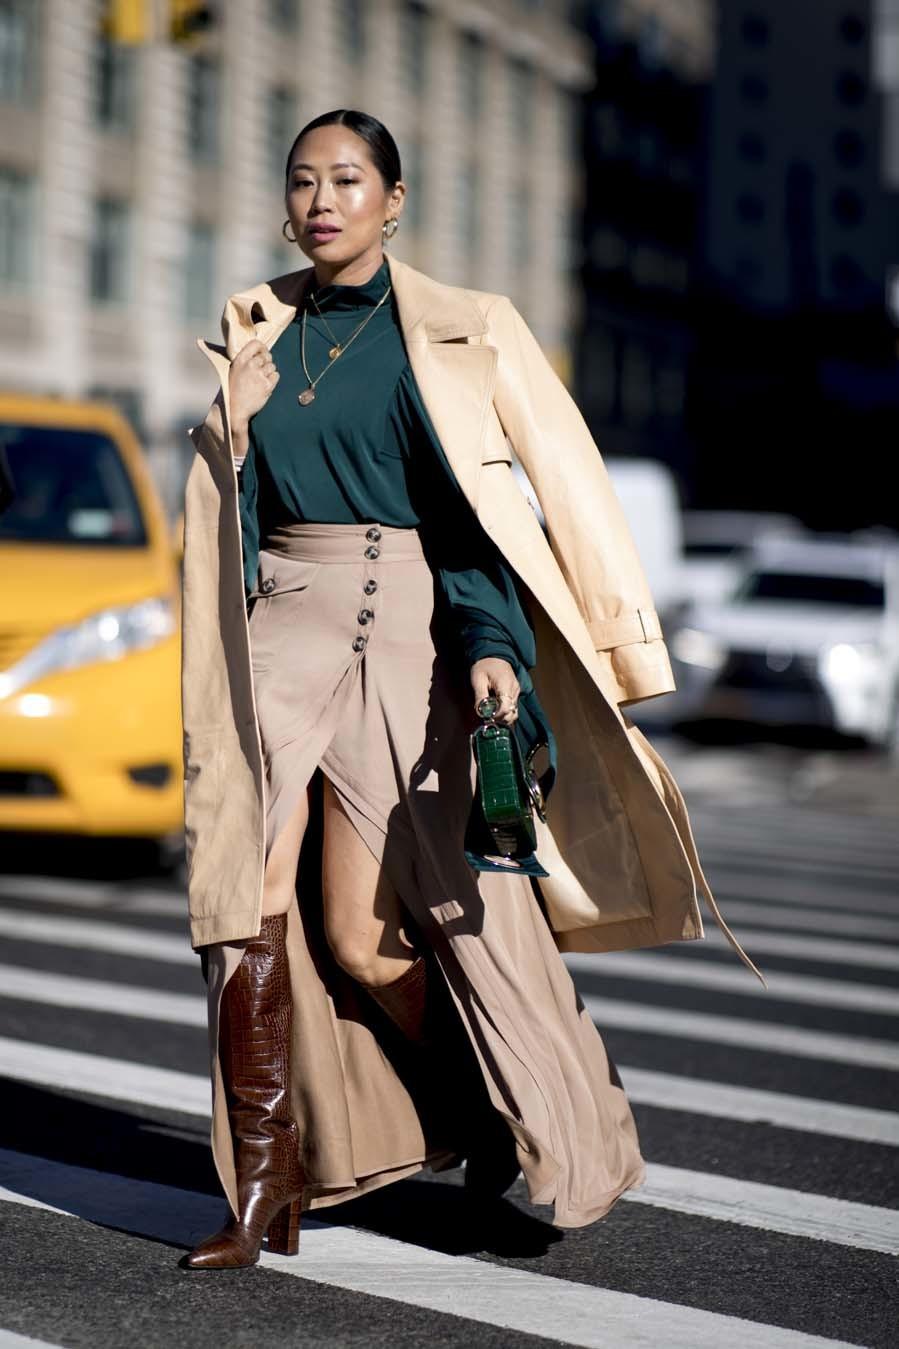 Falda larga con botones - Street style - New York Fashion Week